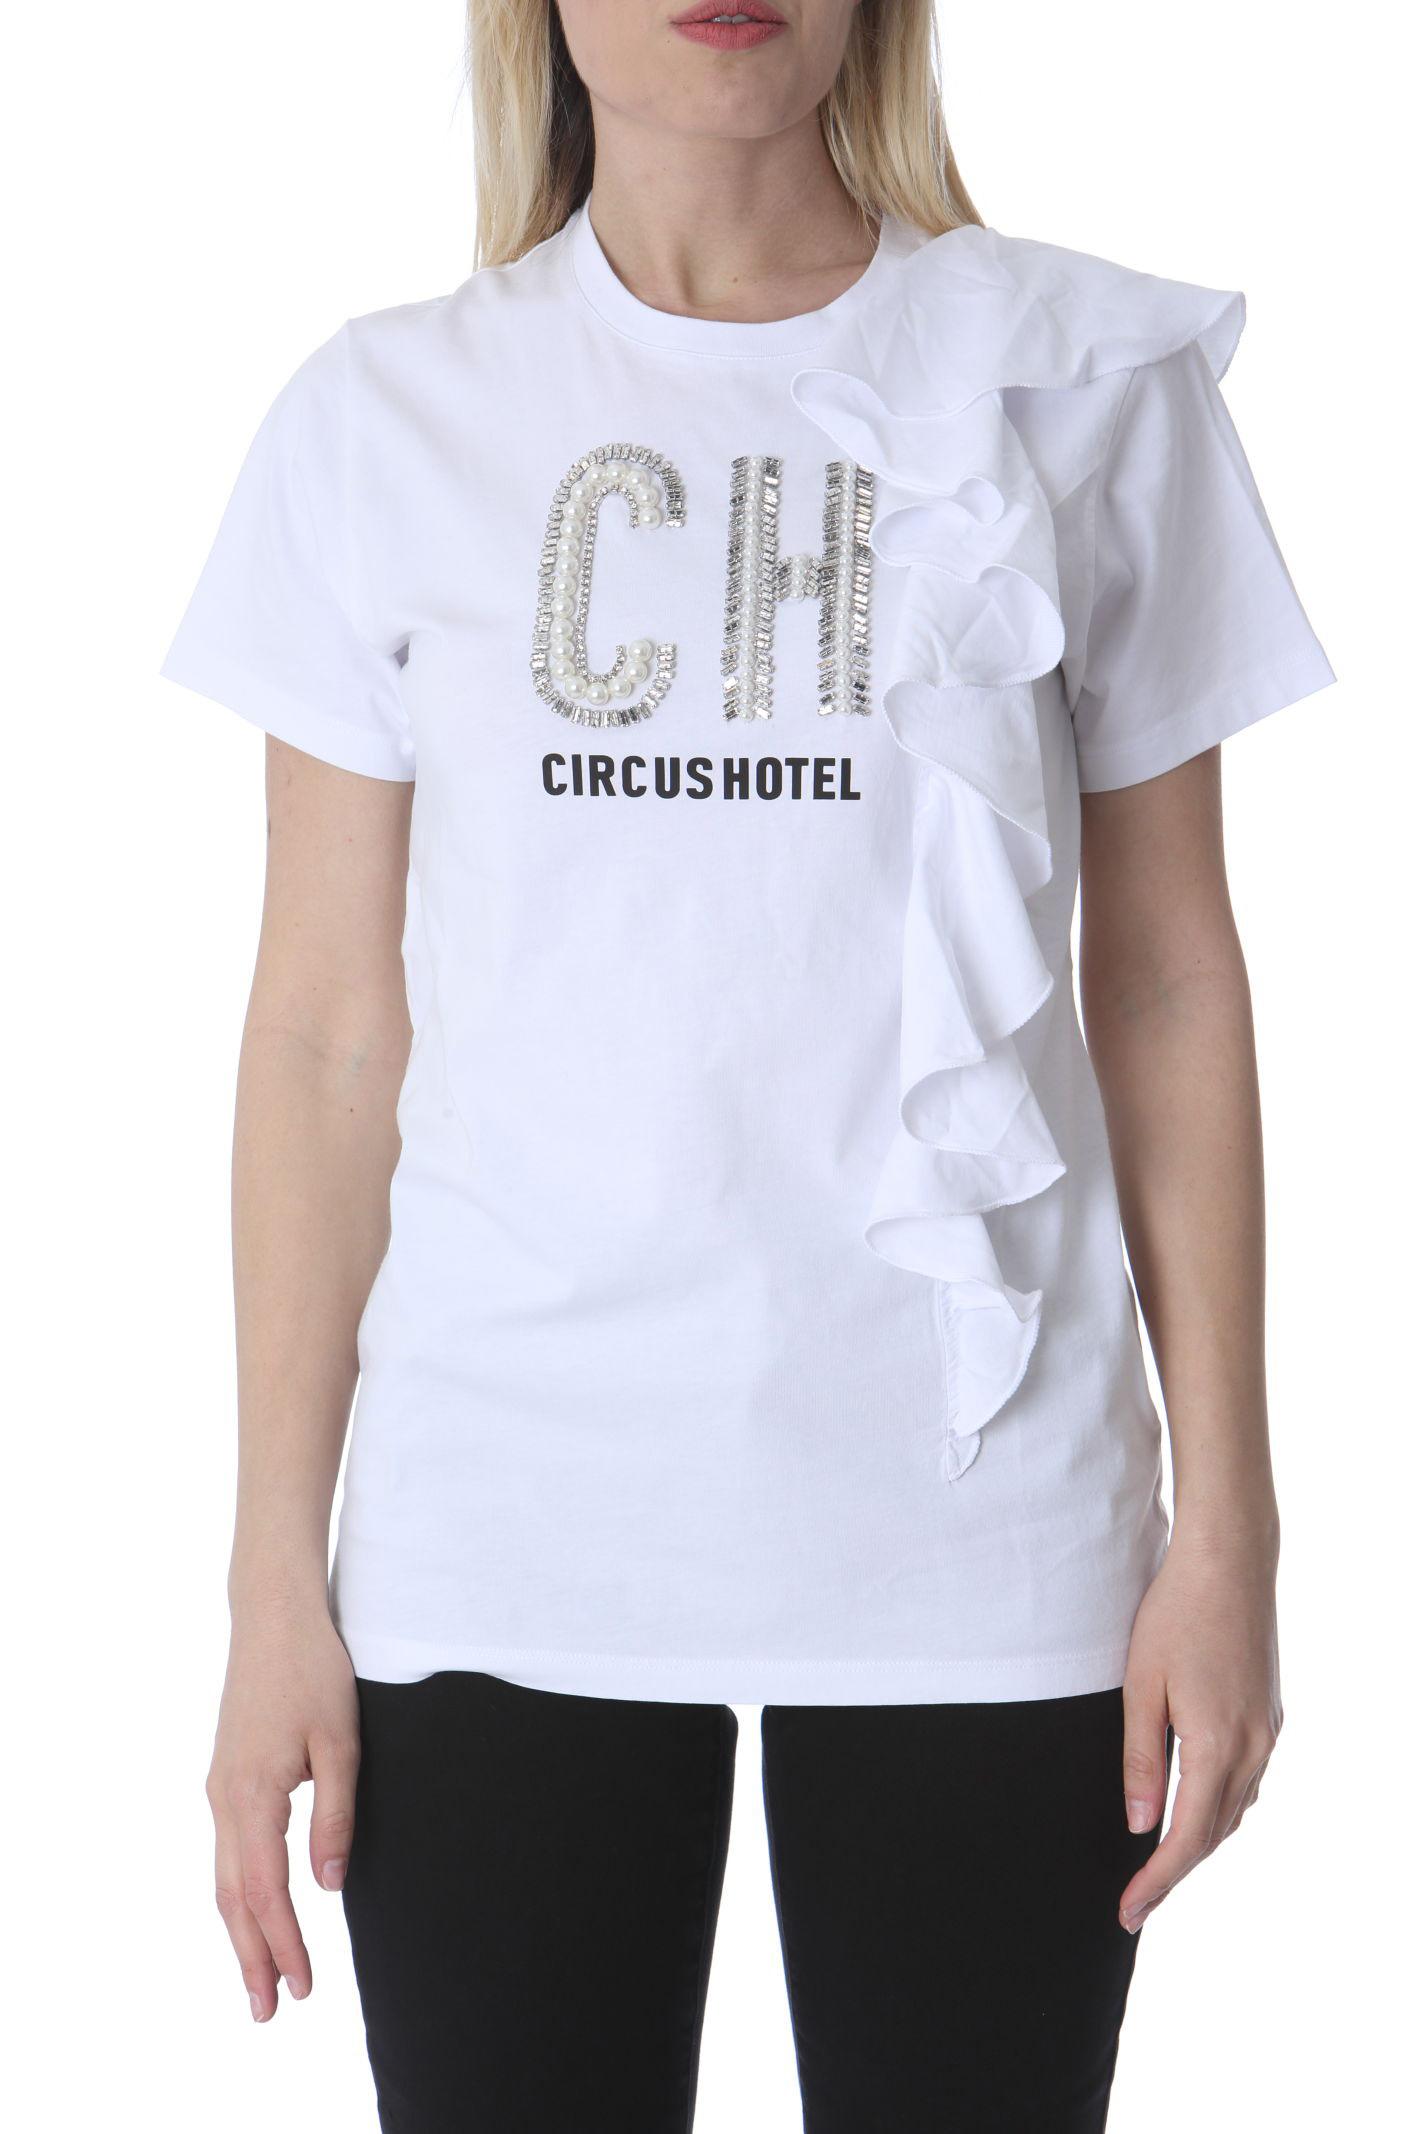 CIRCUS HOTEL      H1ST04A01-0